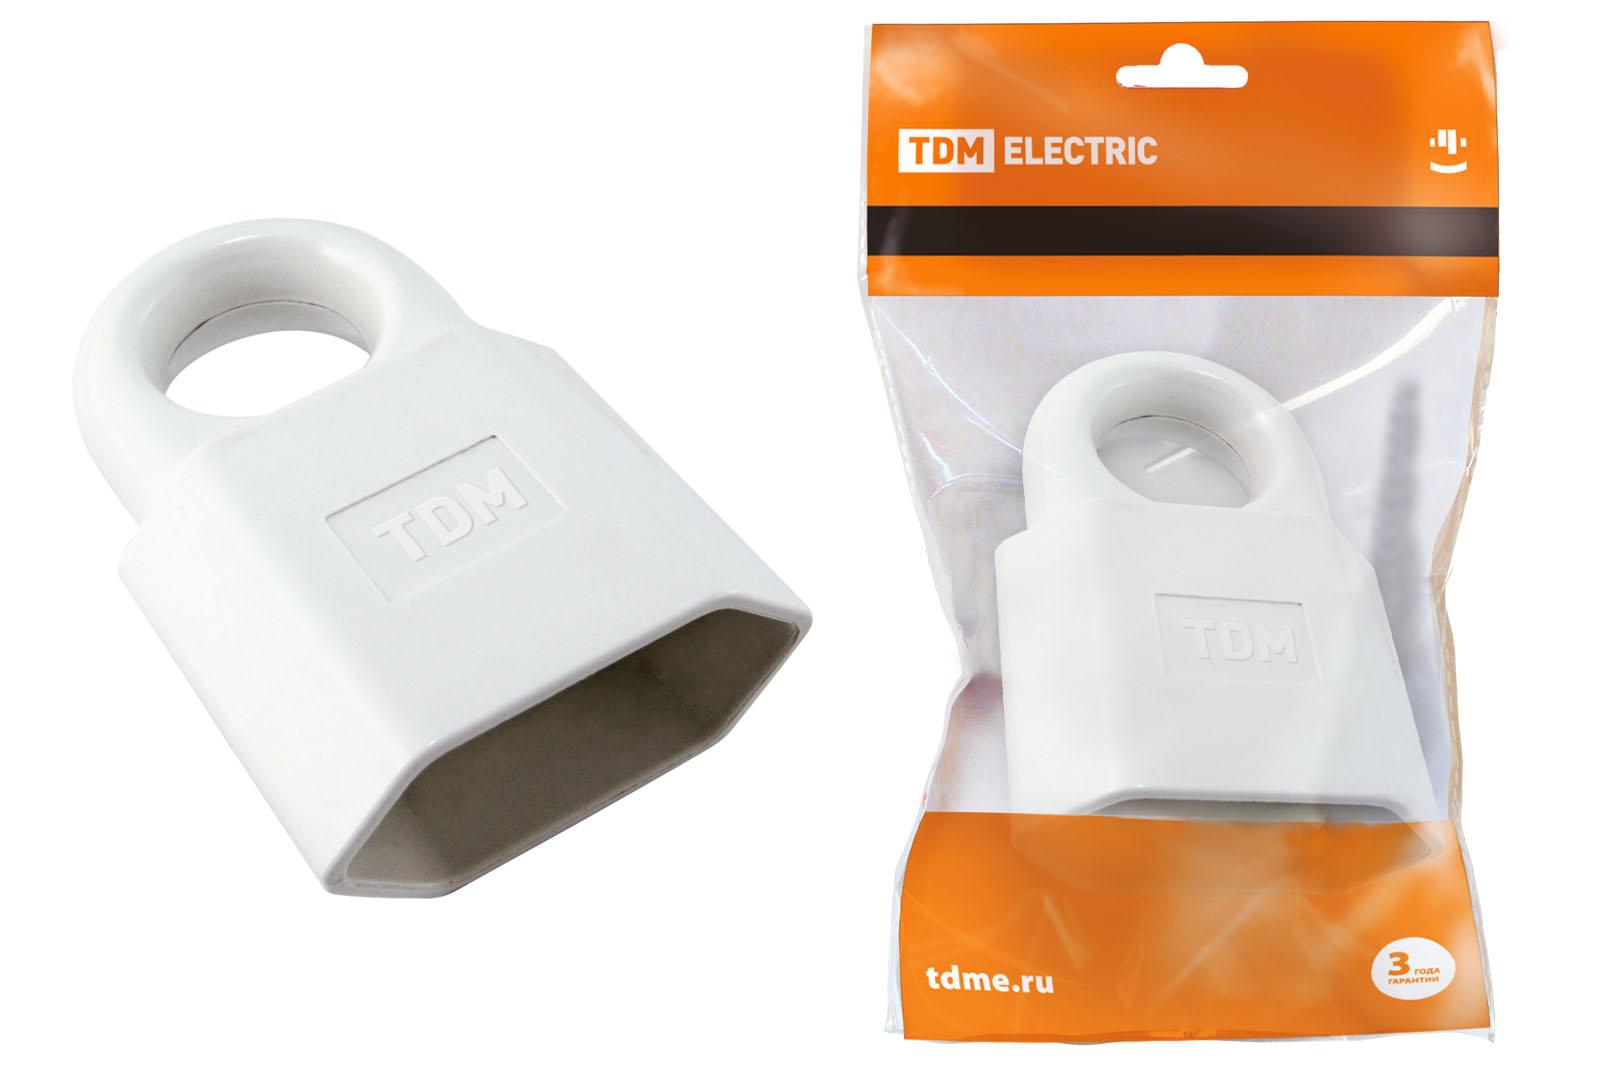 Кабельная розетка 2П 10А 250B (под евровилку CEE 7/16) с з/ш с кольцом белая